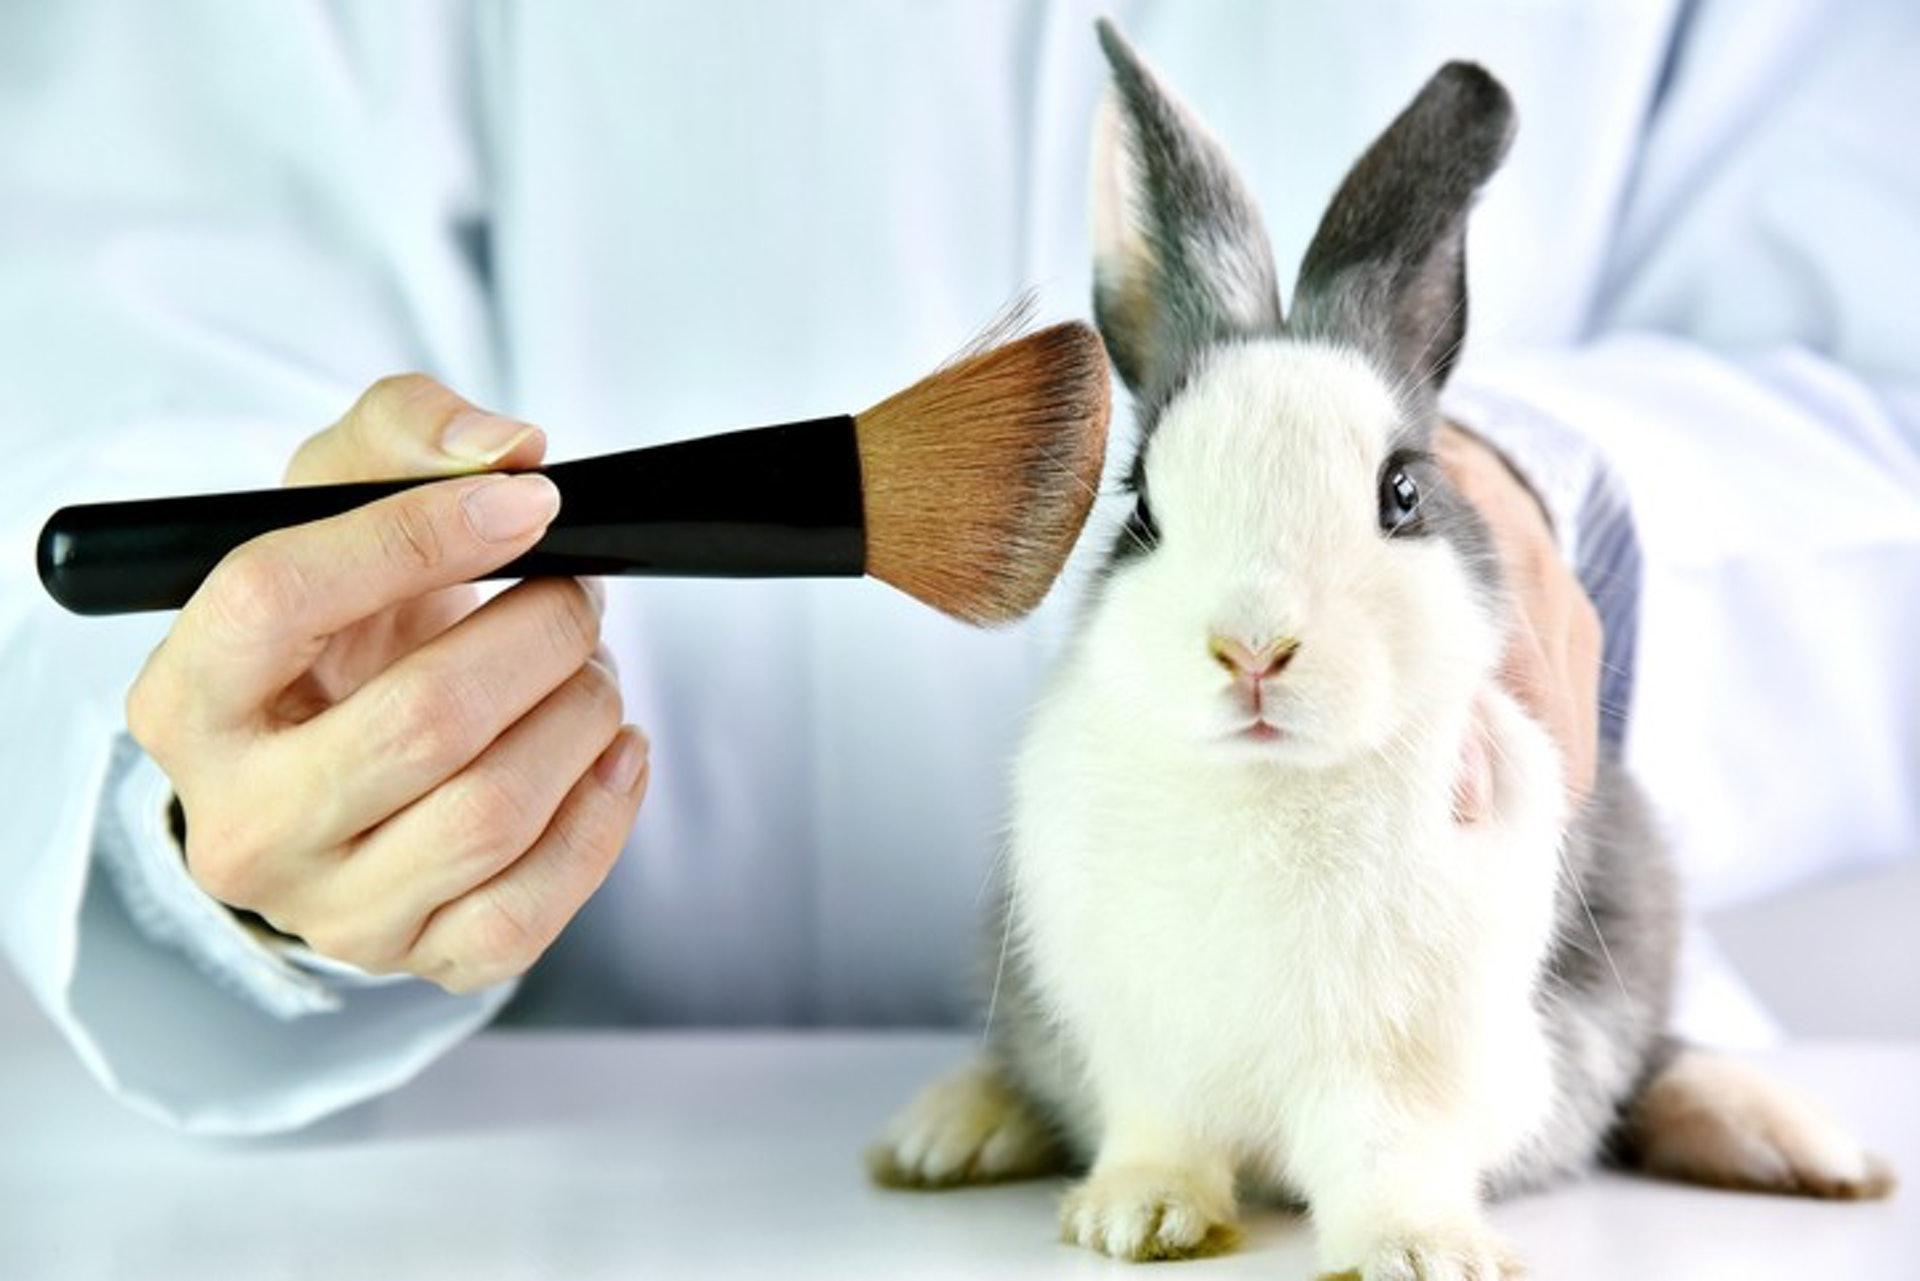 Clean Beauty的產品在生產過程中,需確保不經動物測試。(圖片:Getty Images)